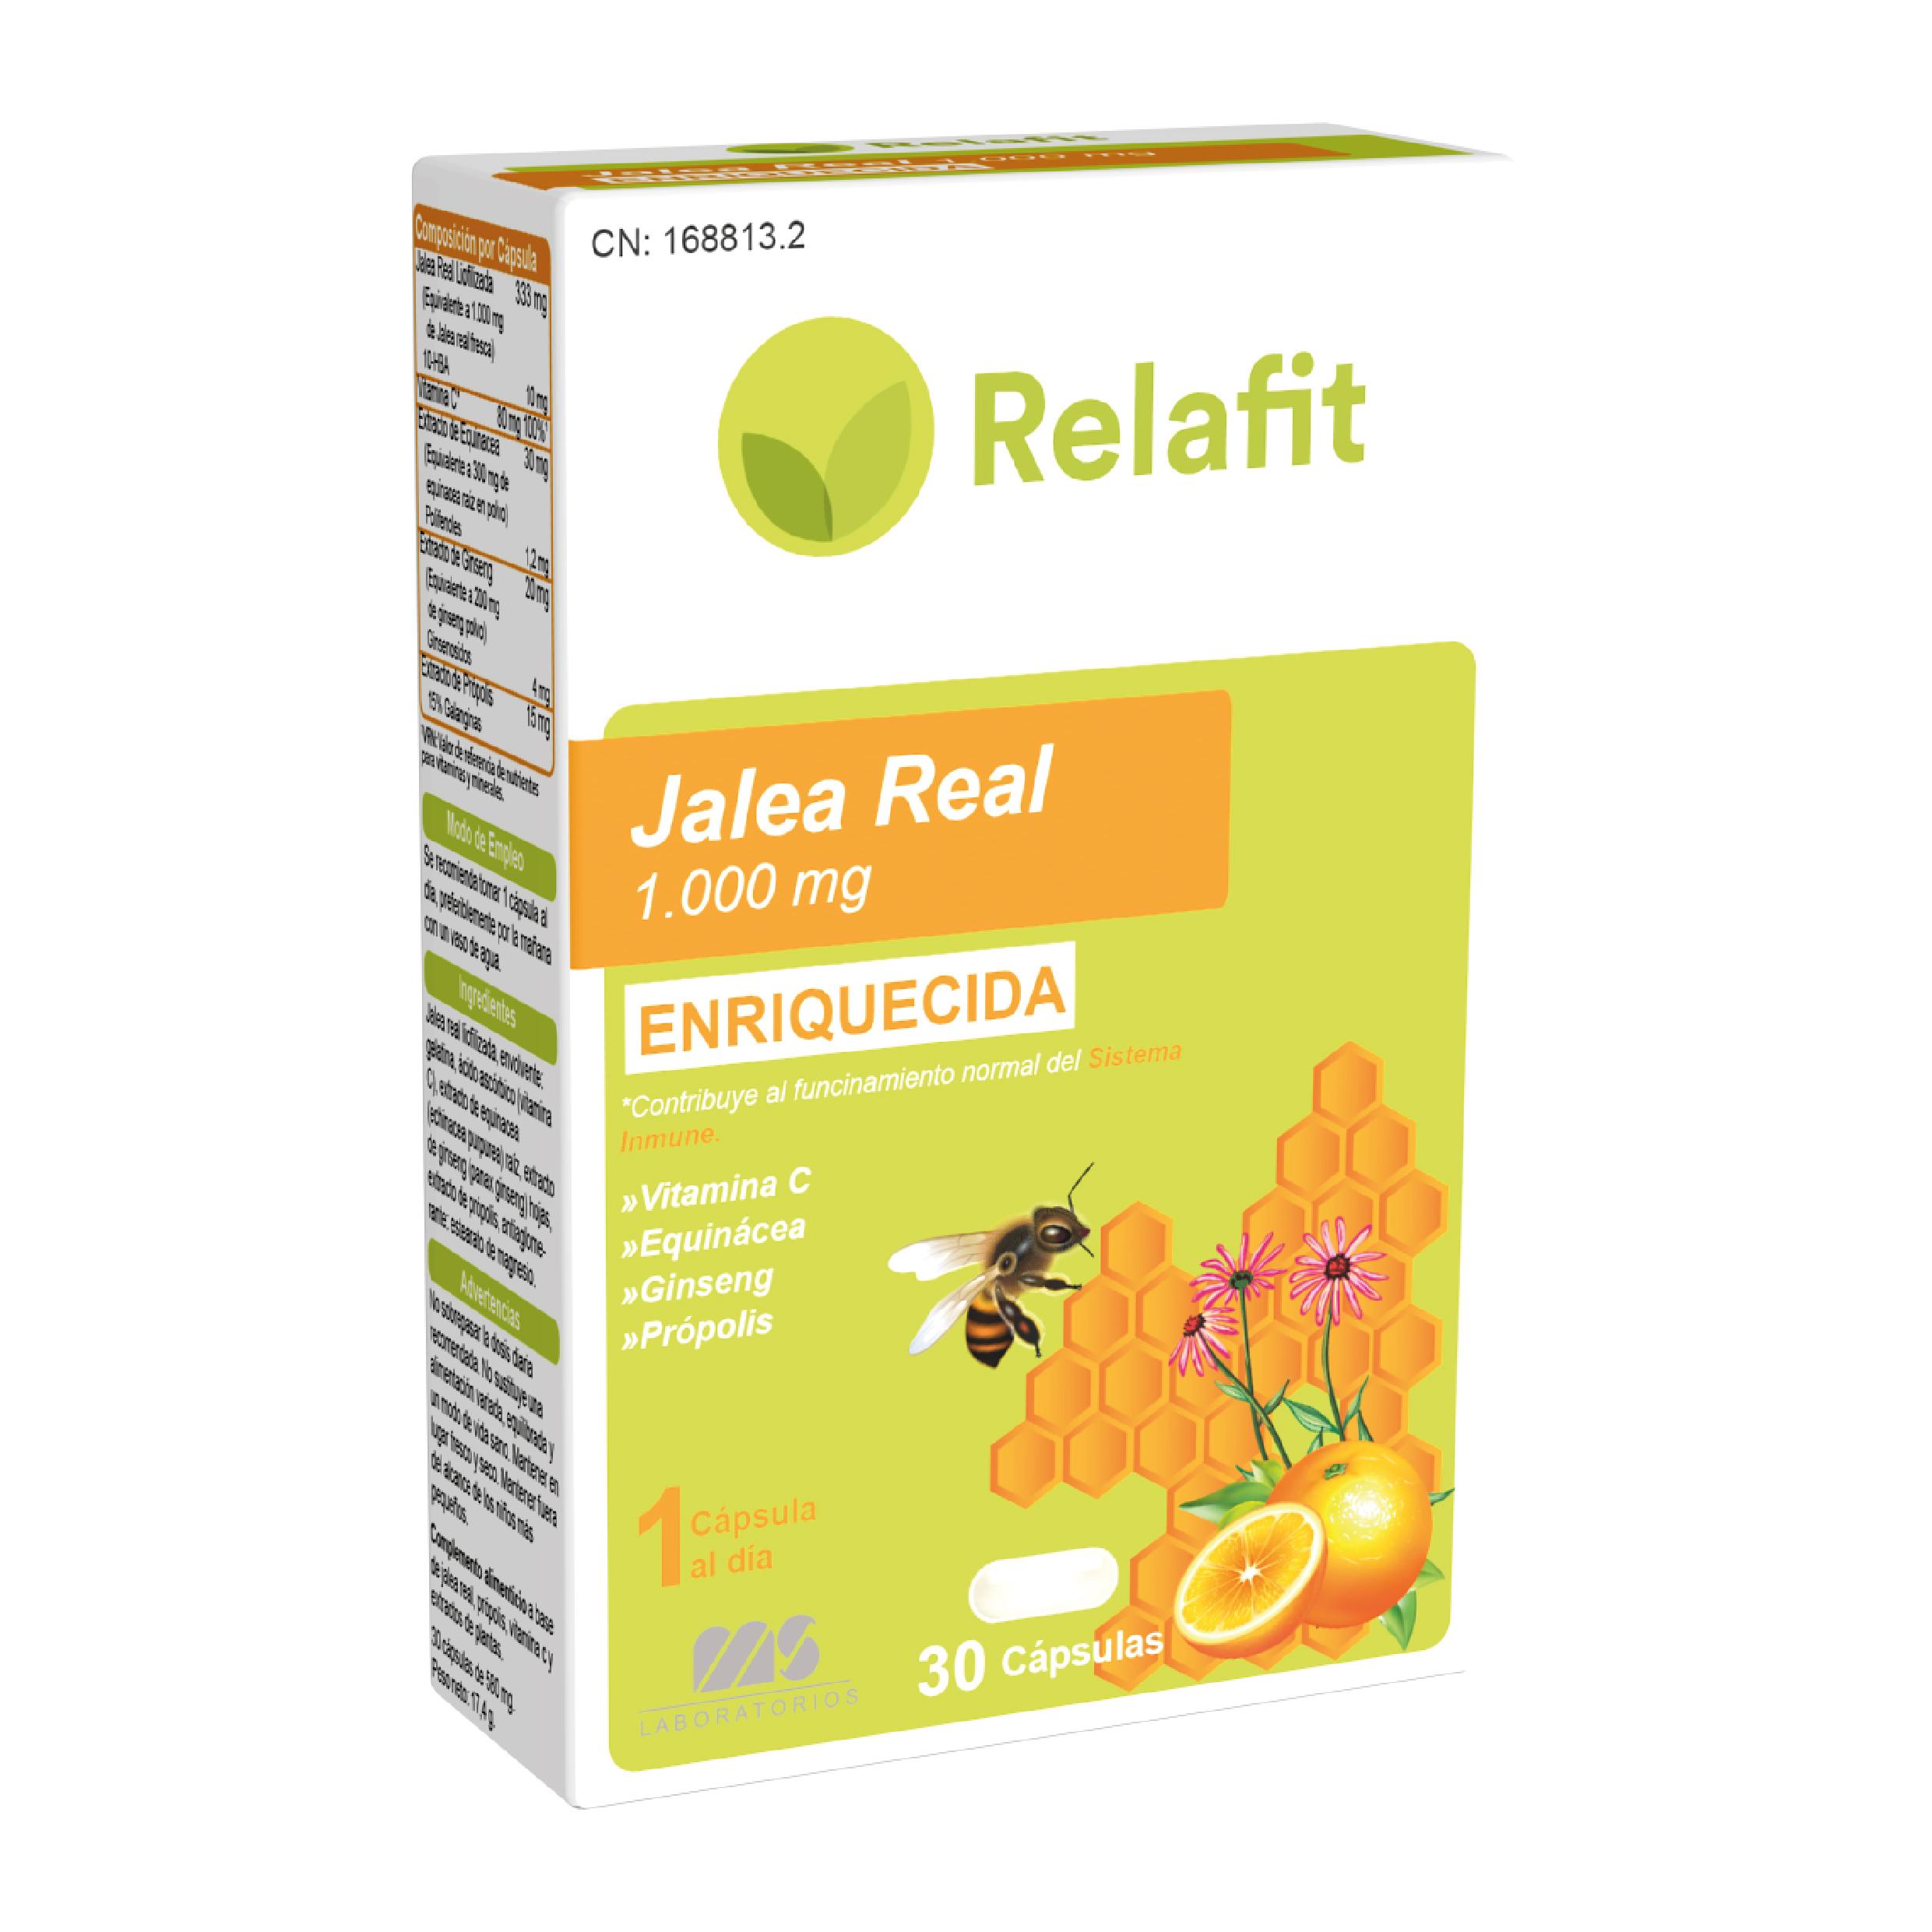 Jalea Real 1.000 mg